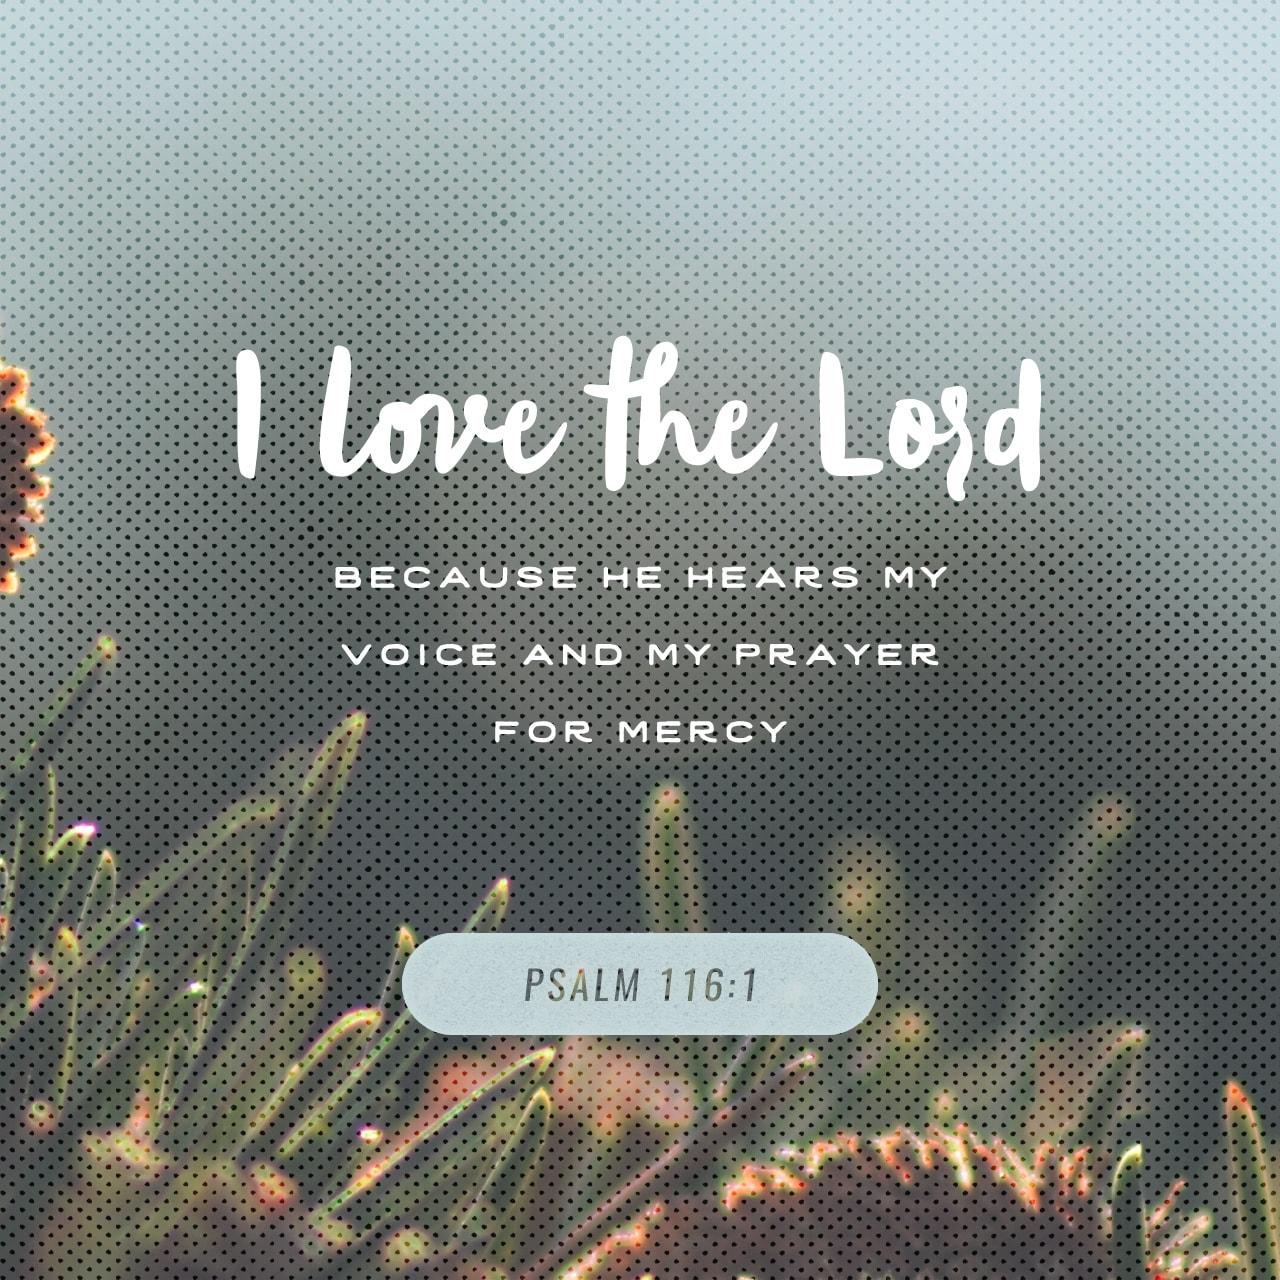 Psalm 116:1